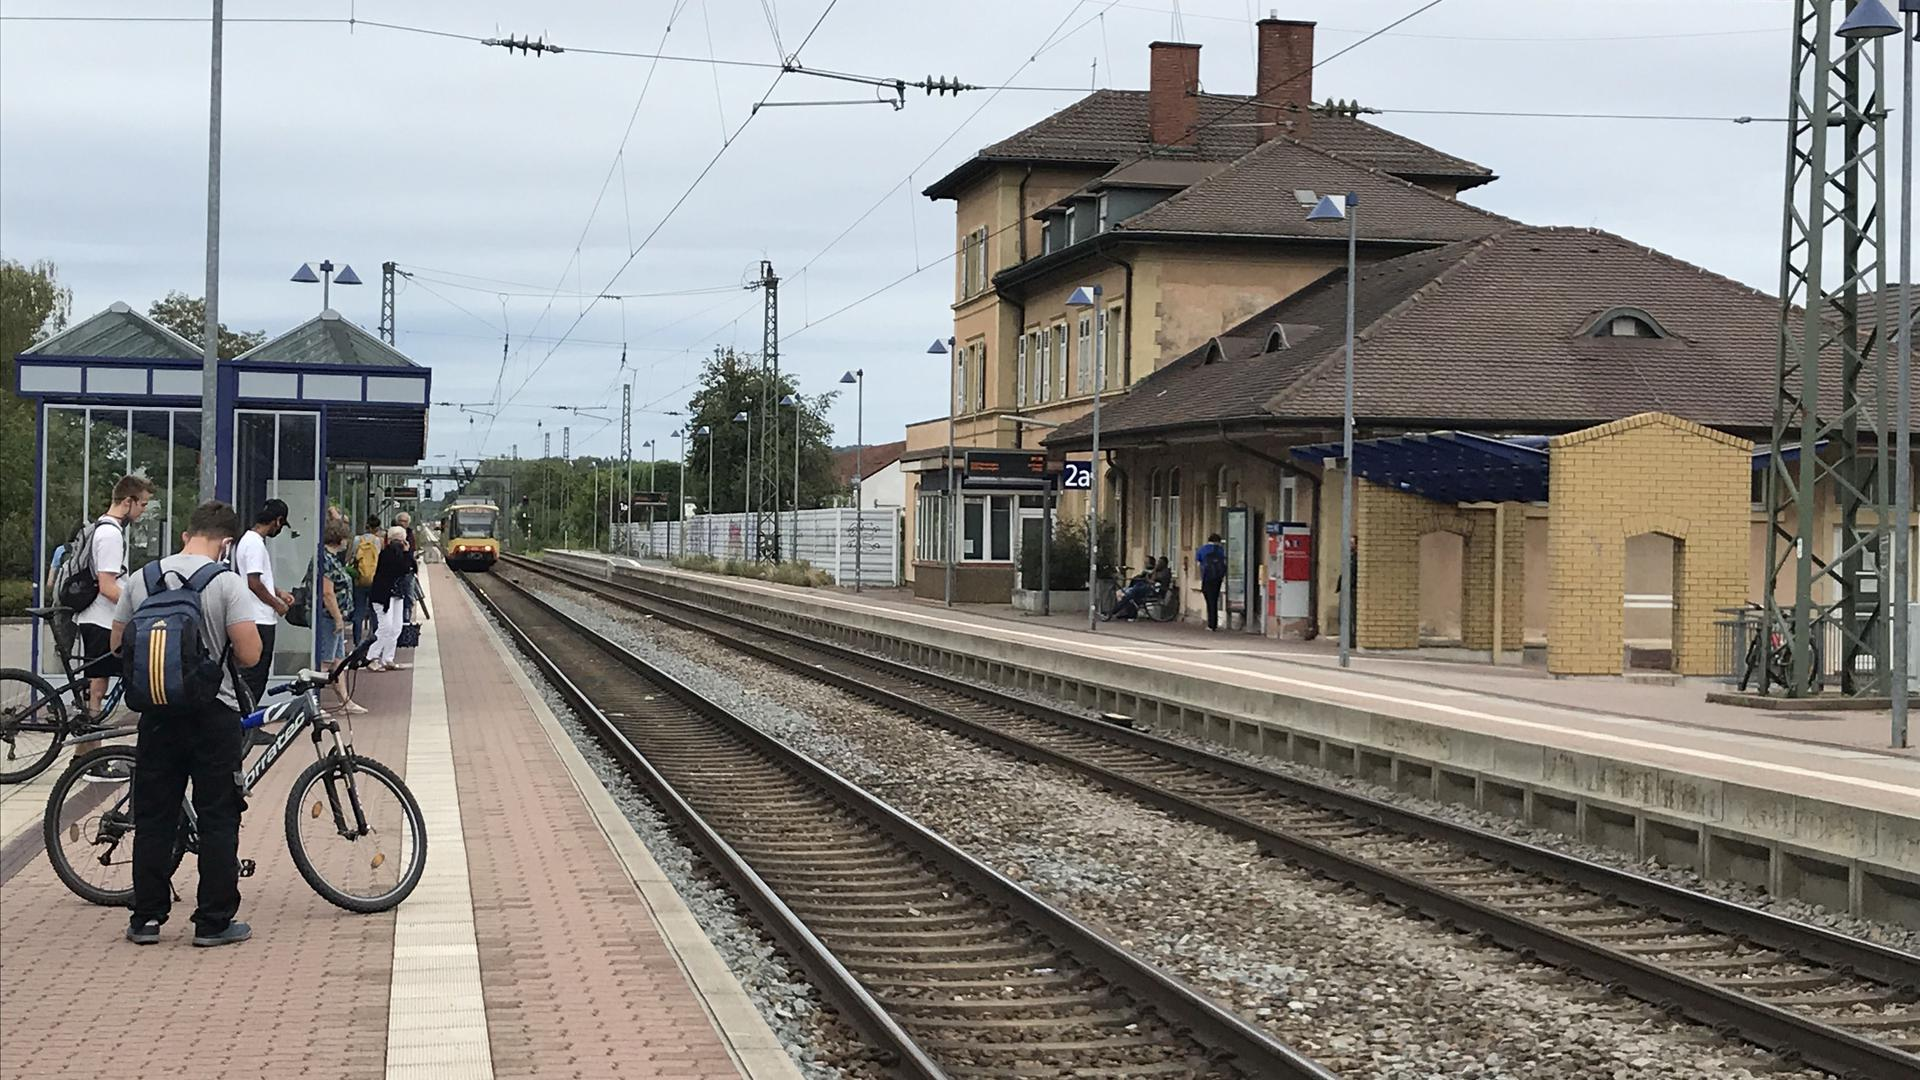 Bahnhof Weingarten